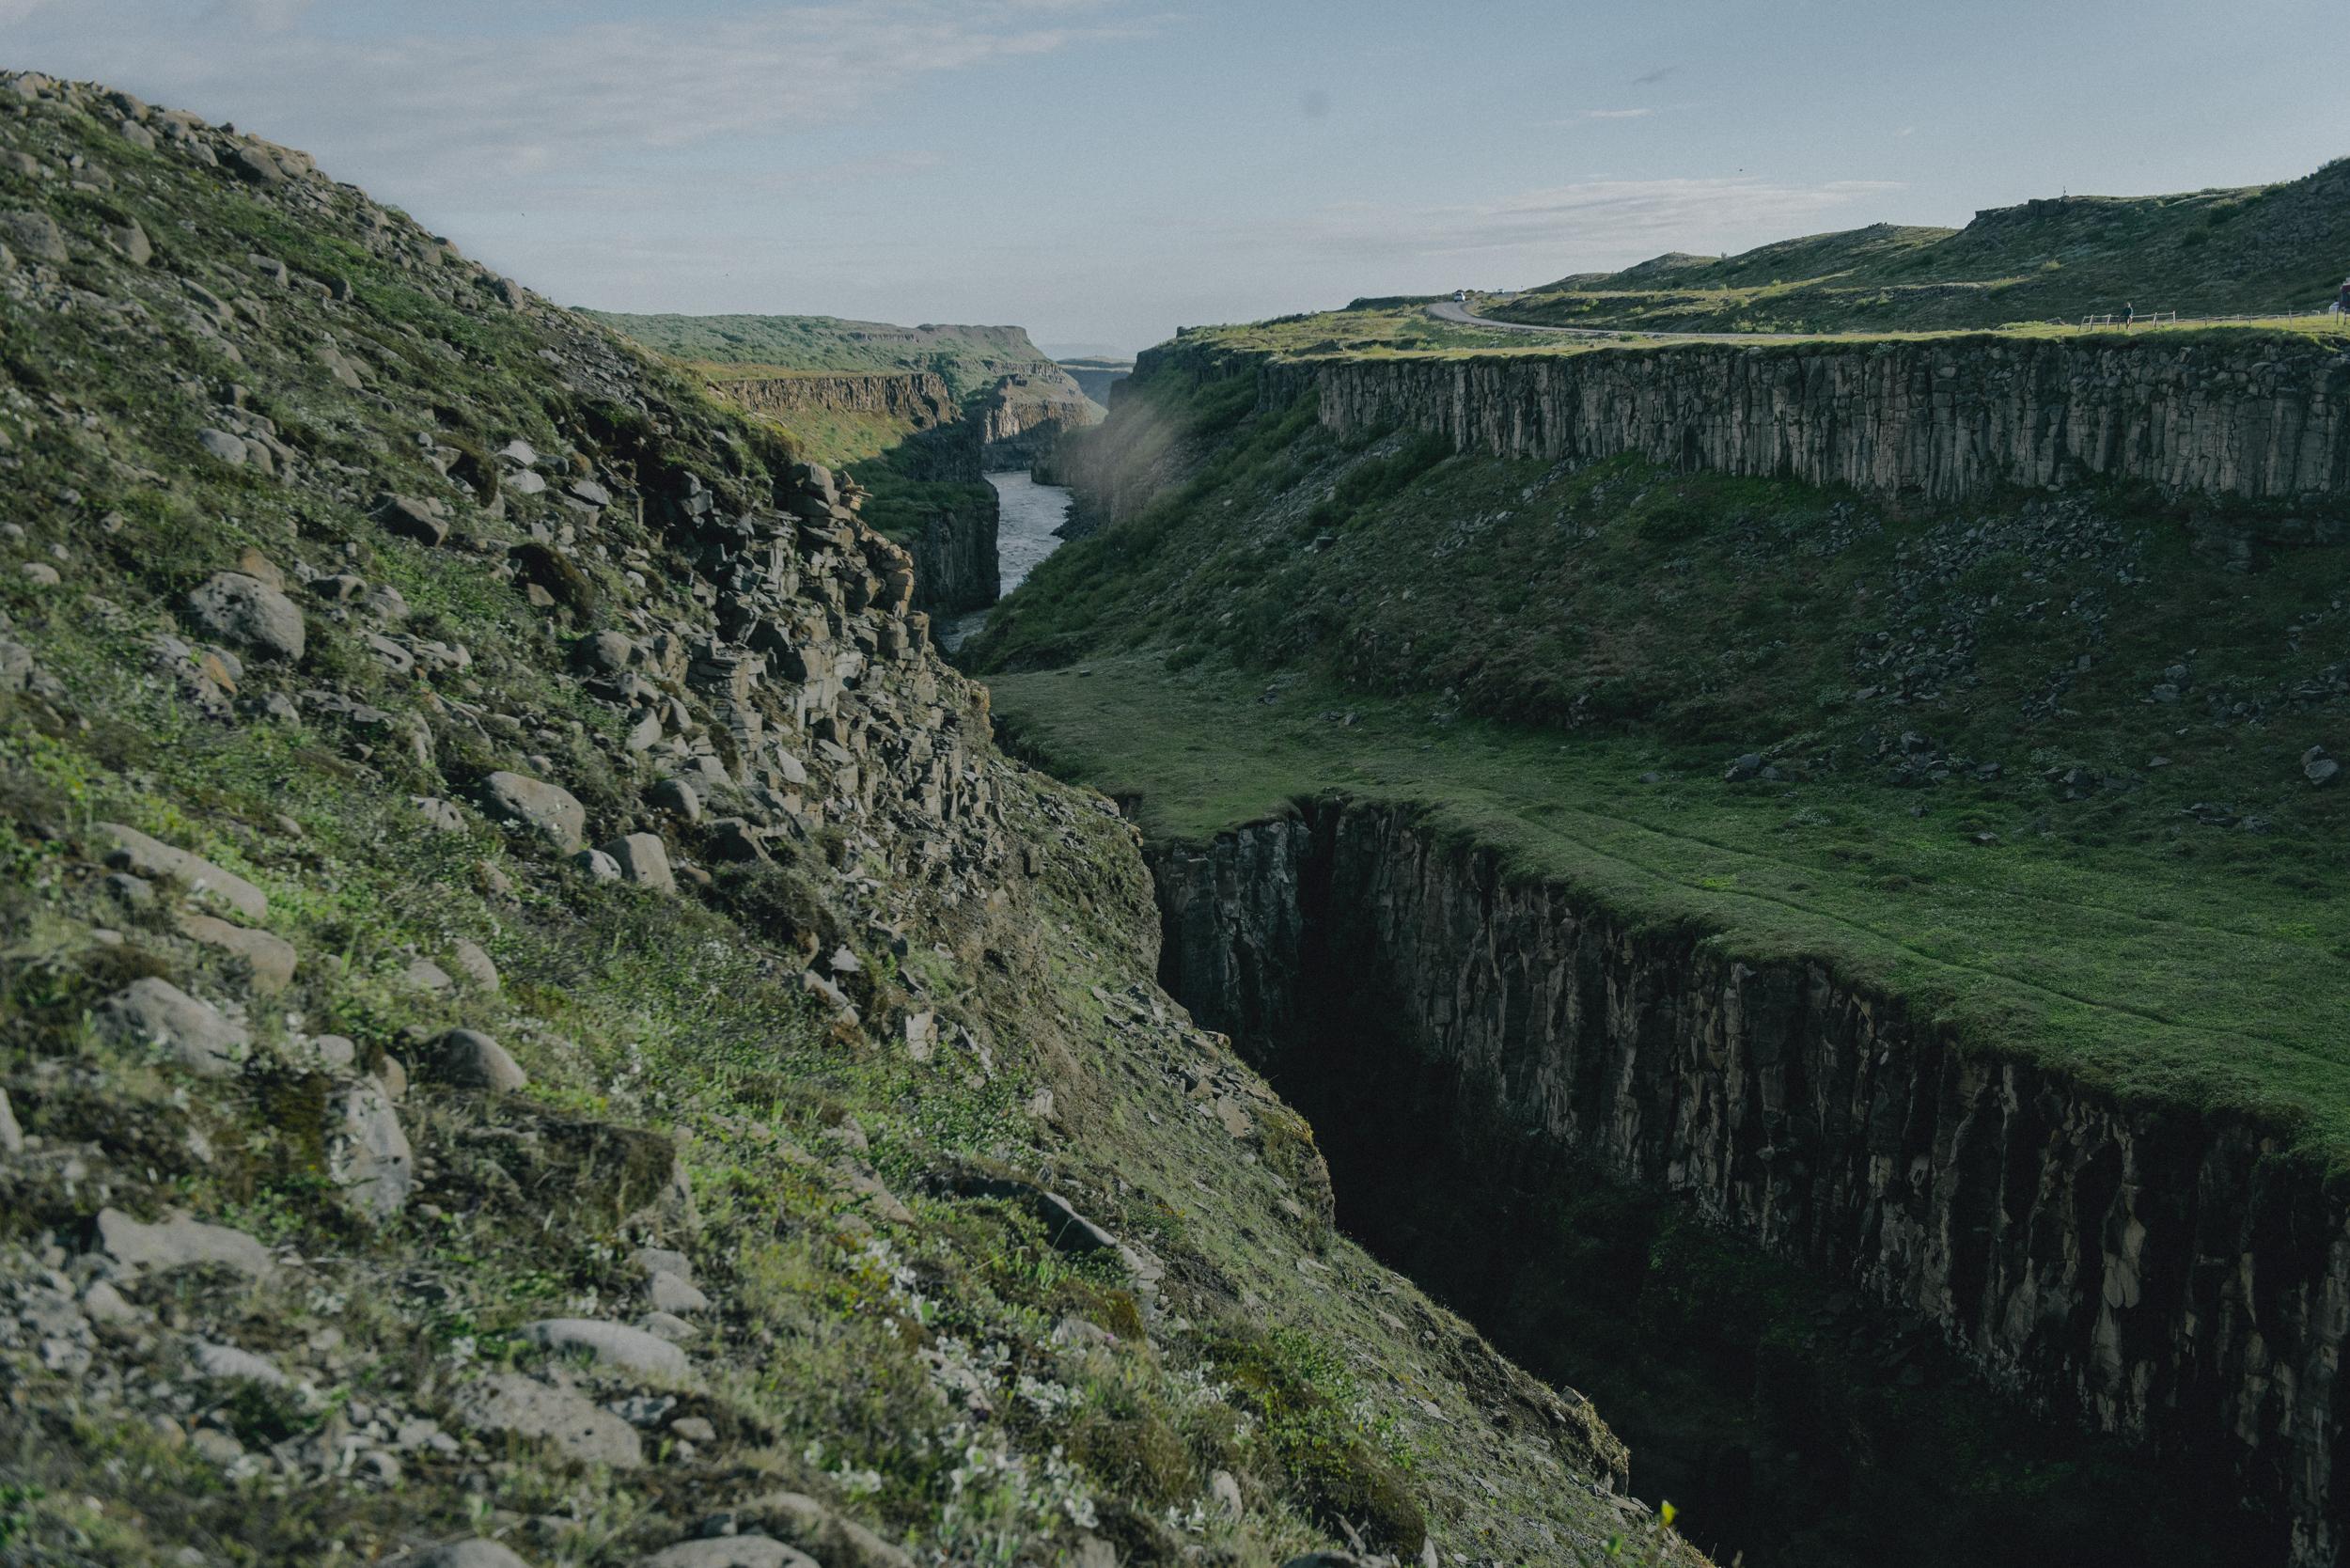 BexarGoods_Iceland_7150.jpg